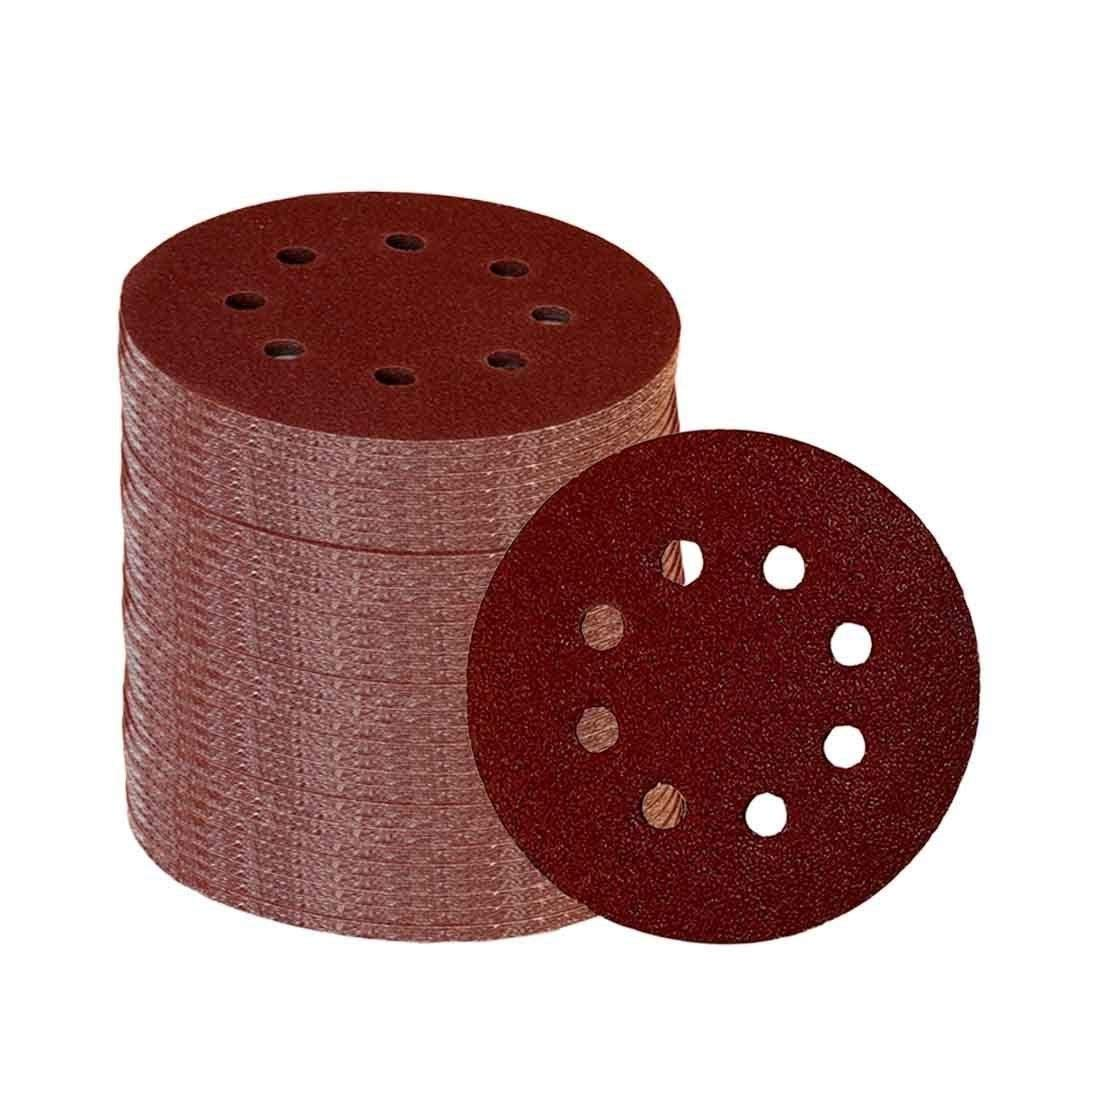 SYH01 60 Pieces 8 Holes 5 Inch Sanding Discs Hook Loop 60/100/180/240/320/400 Grit Sander Machine Sander Deglosser